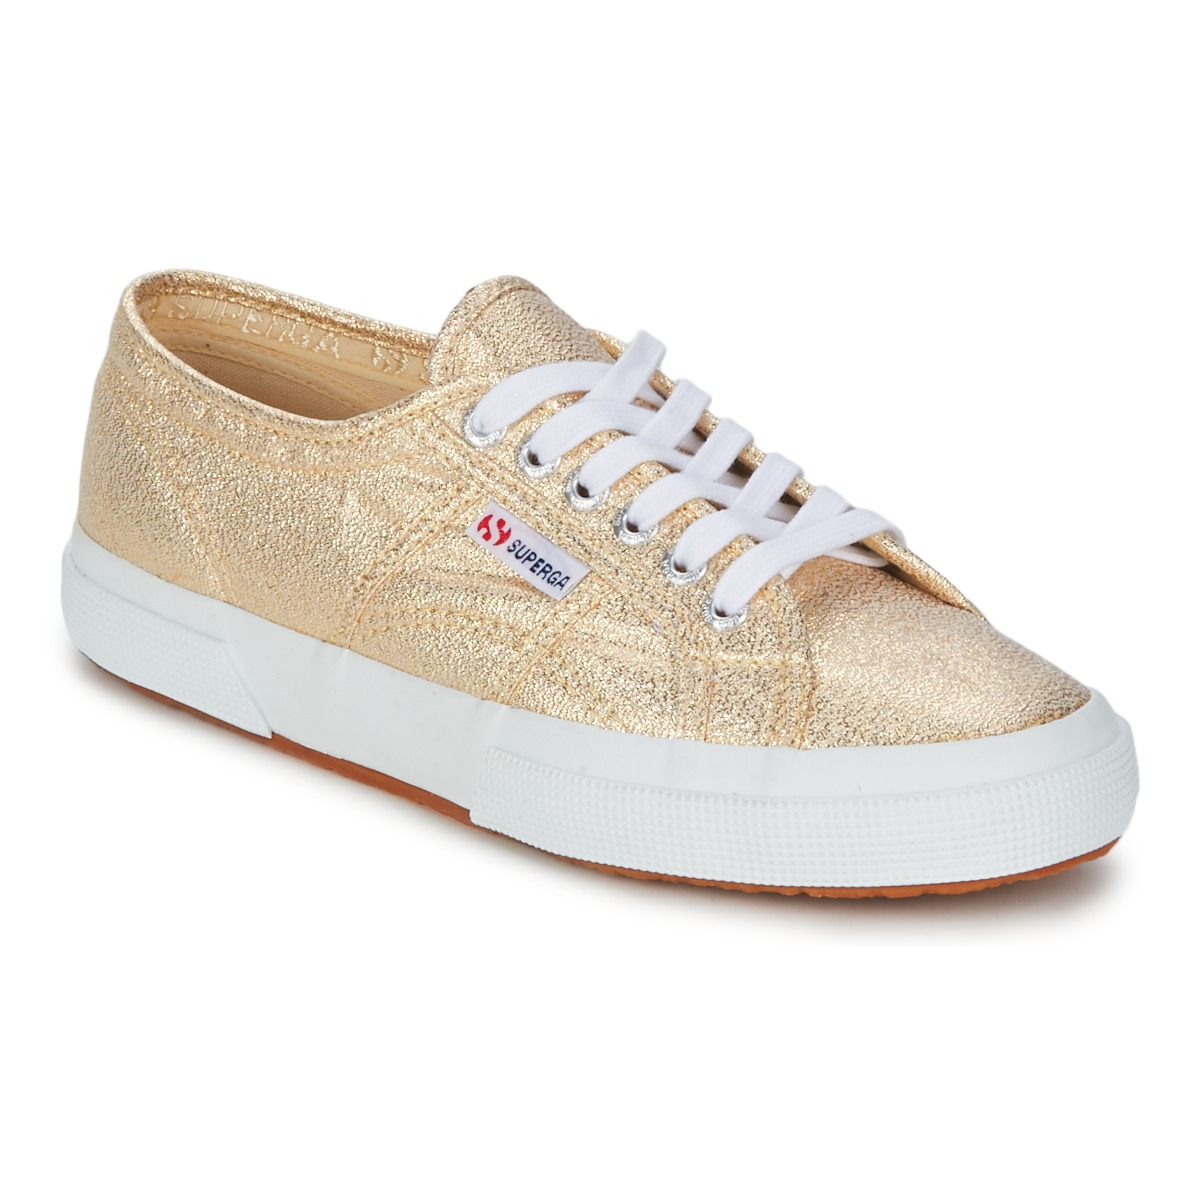 Chaussures De Sport Lage 2790 Lame W Superga aZml7e